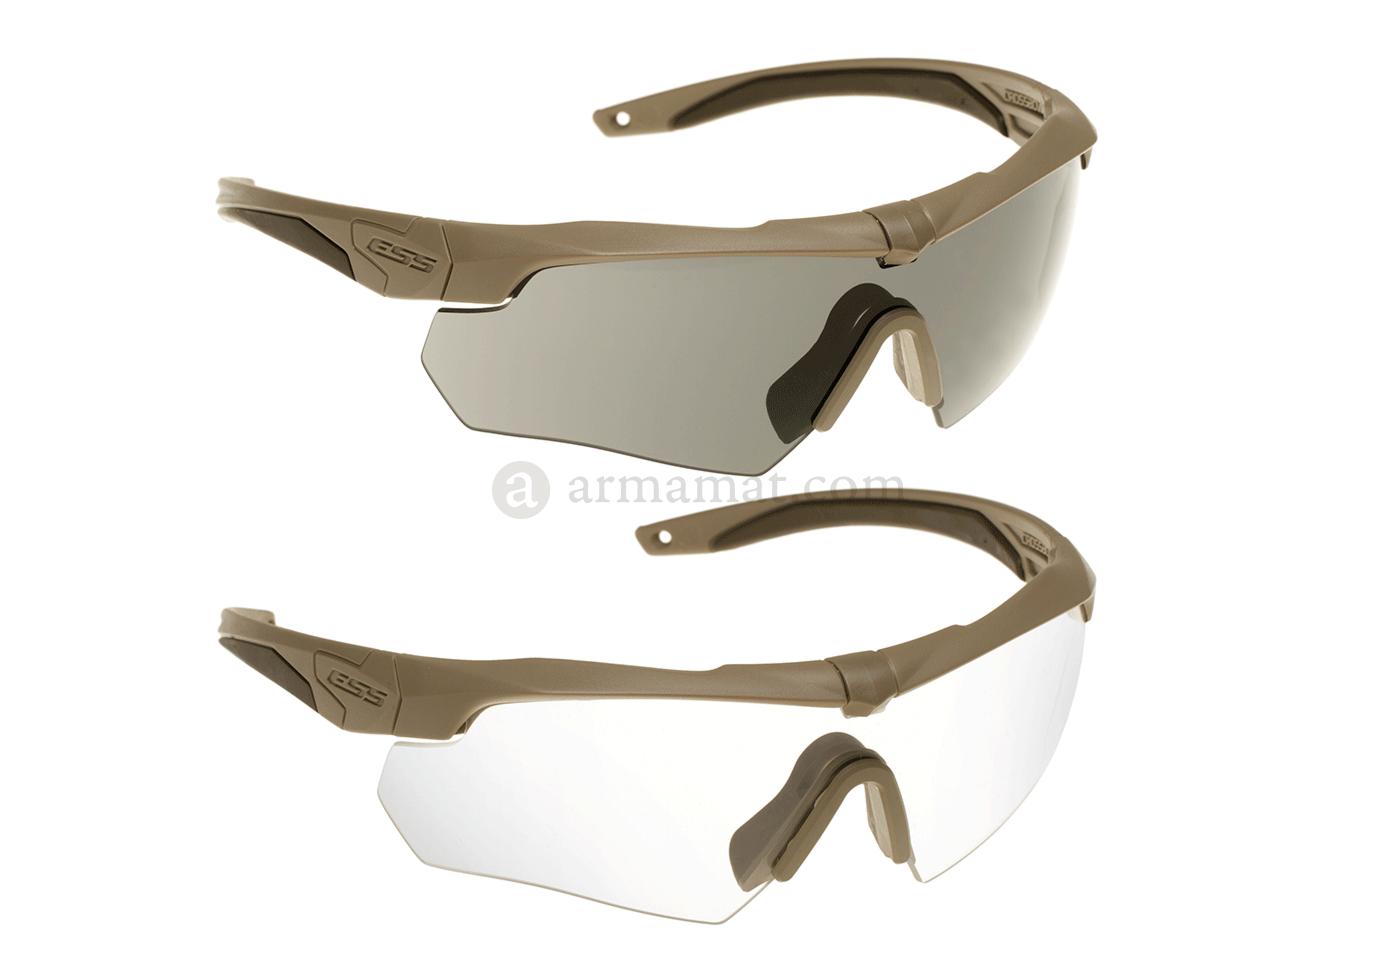 512afa060e9 Crossbow 2x Kit Tan (ESS) - Glasses - Eyewear - Protective Equipment ...